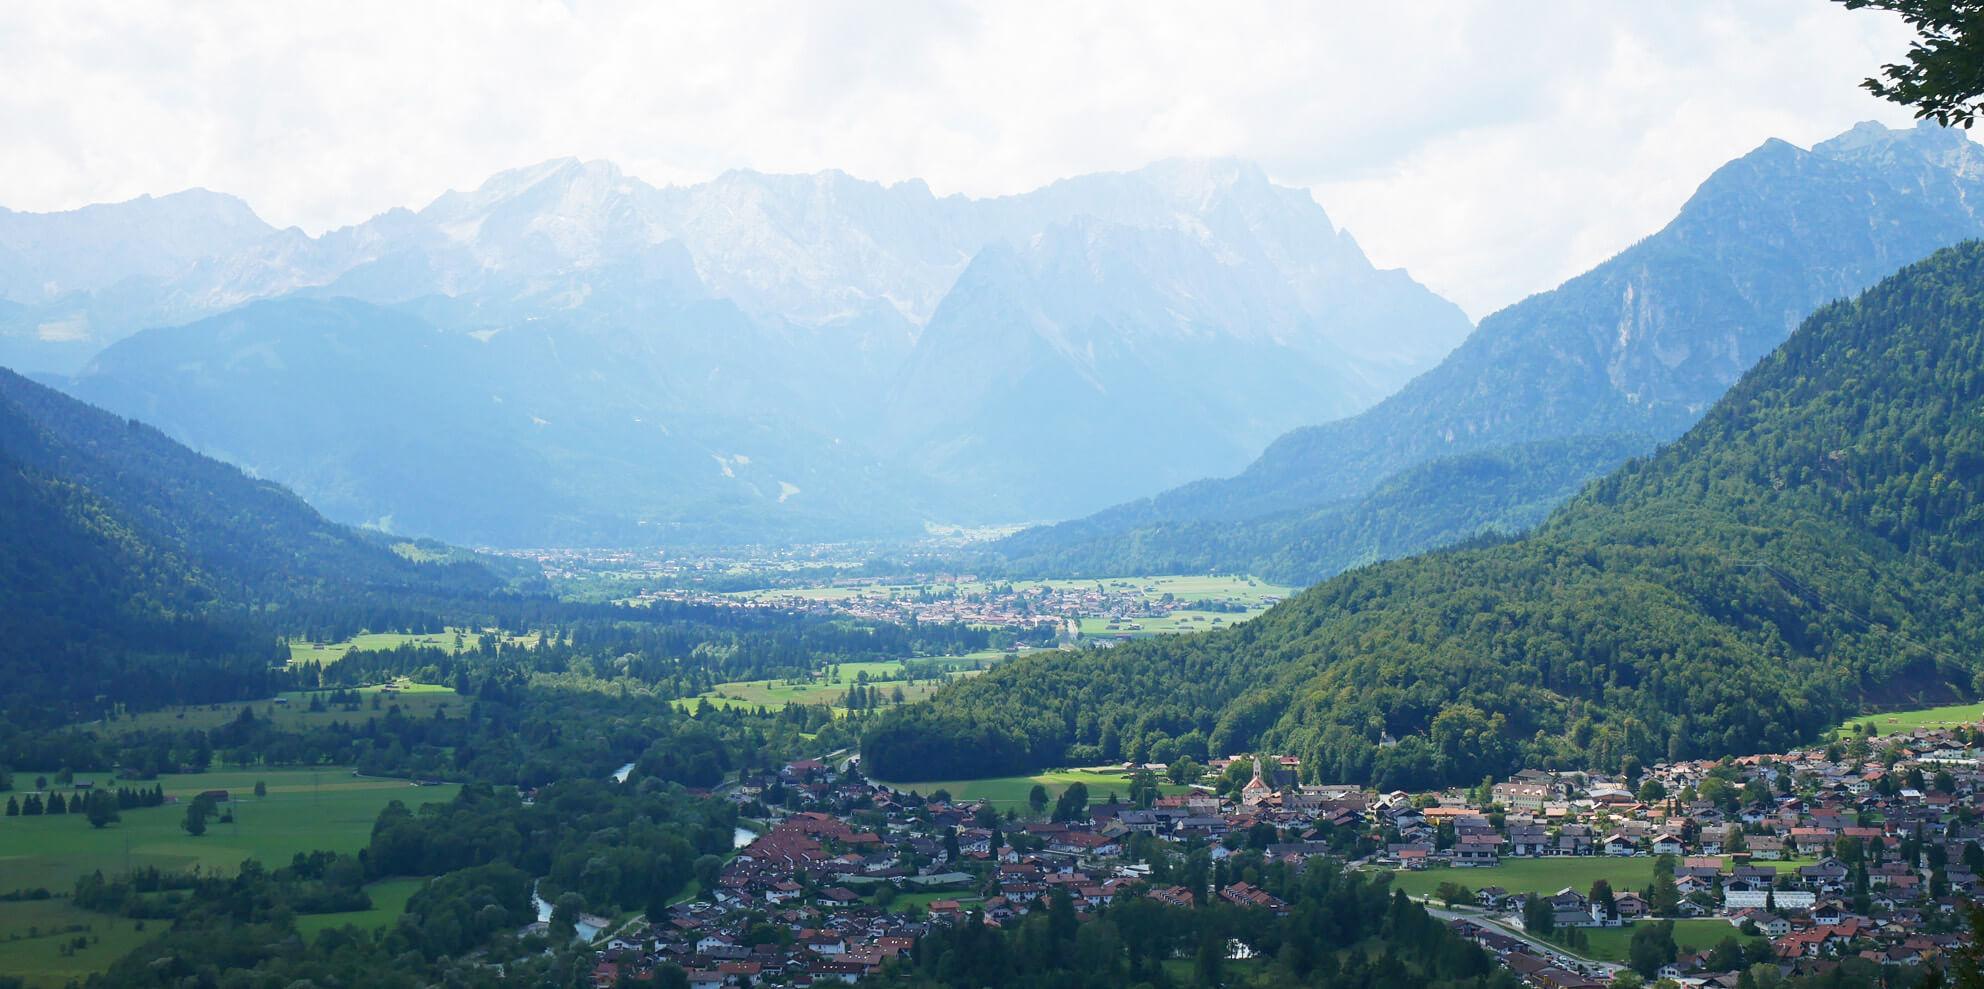 Loisachblick oberau Wettersteingebirge